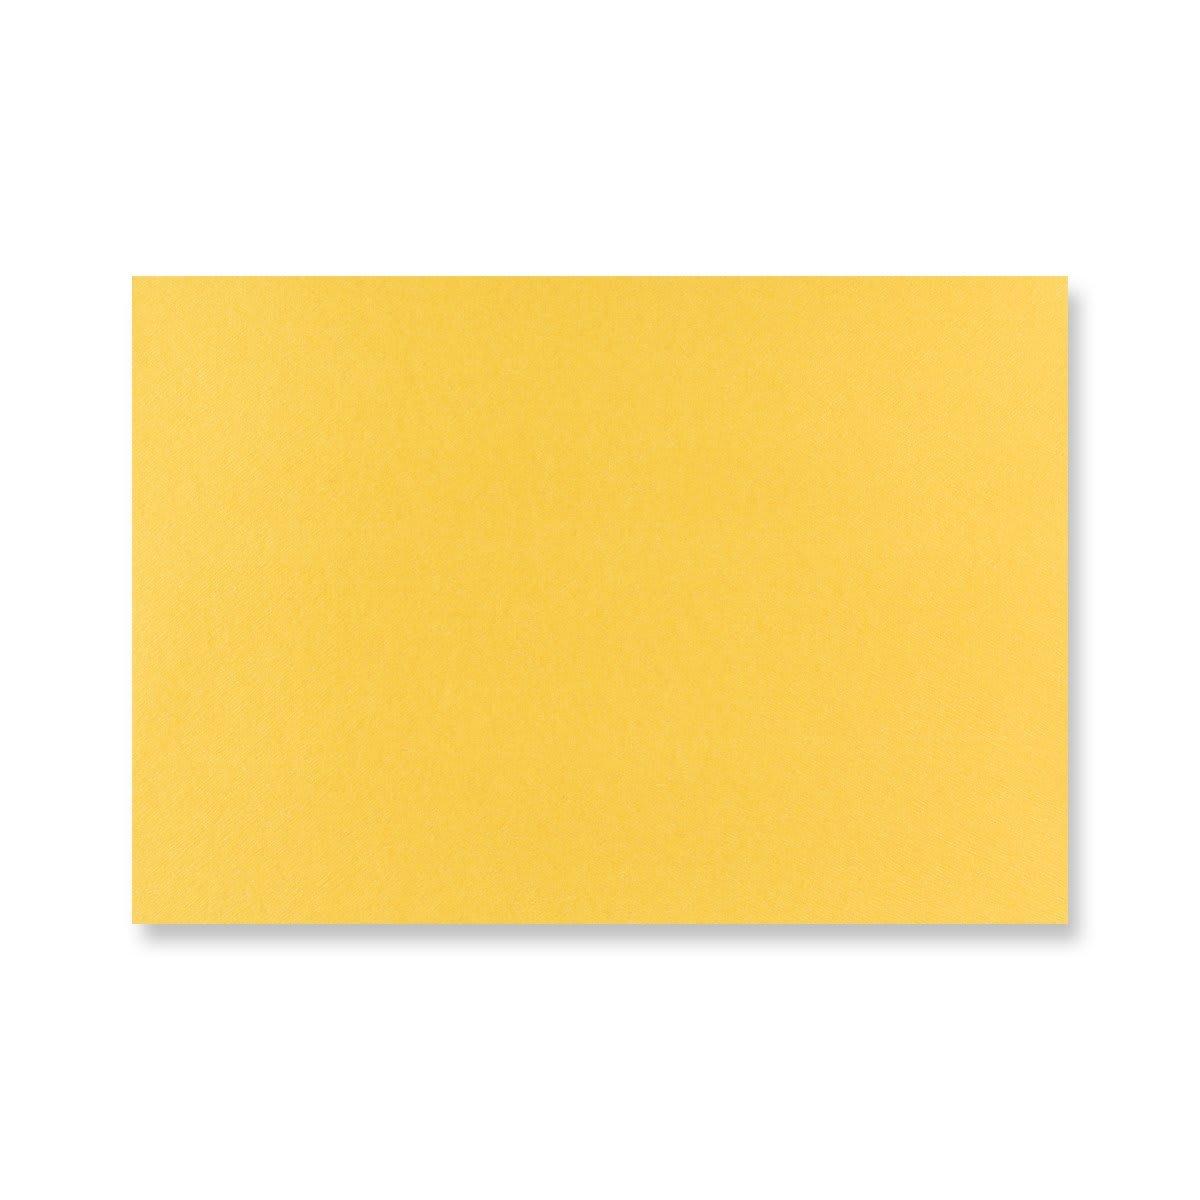 C5 GOLDEN YELLOW BUTTERFLY ENVELOPES